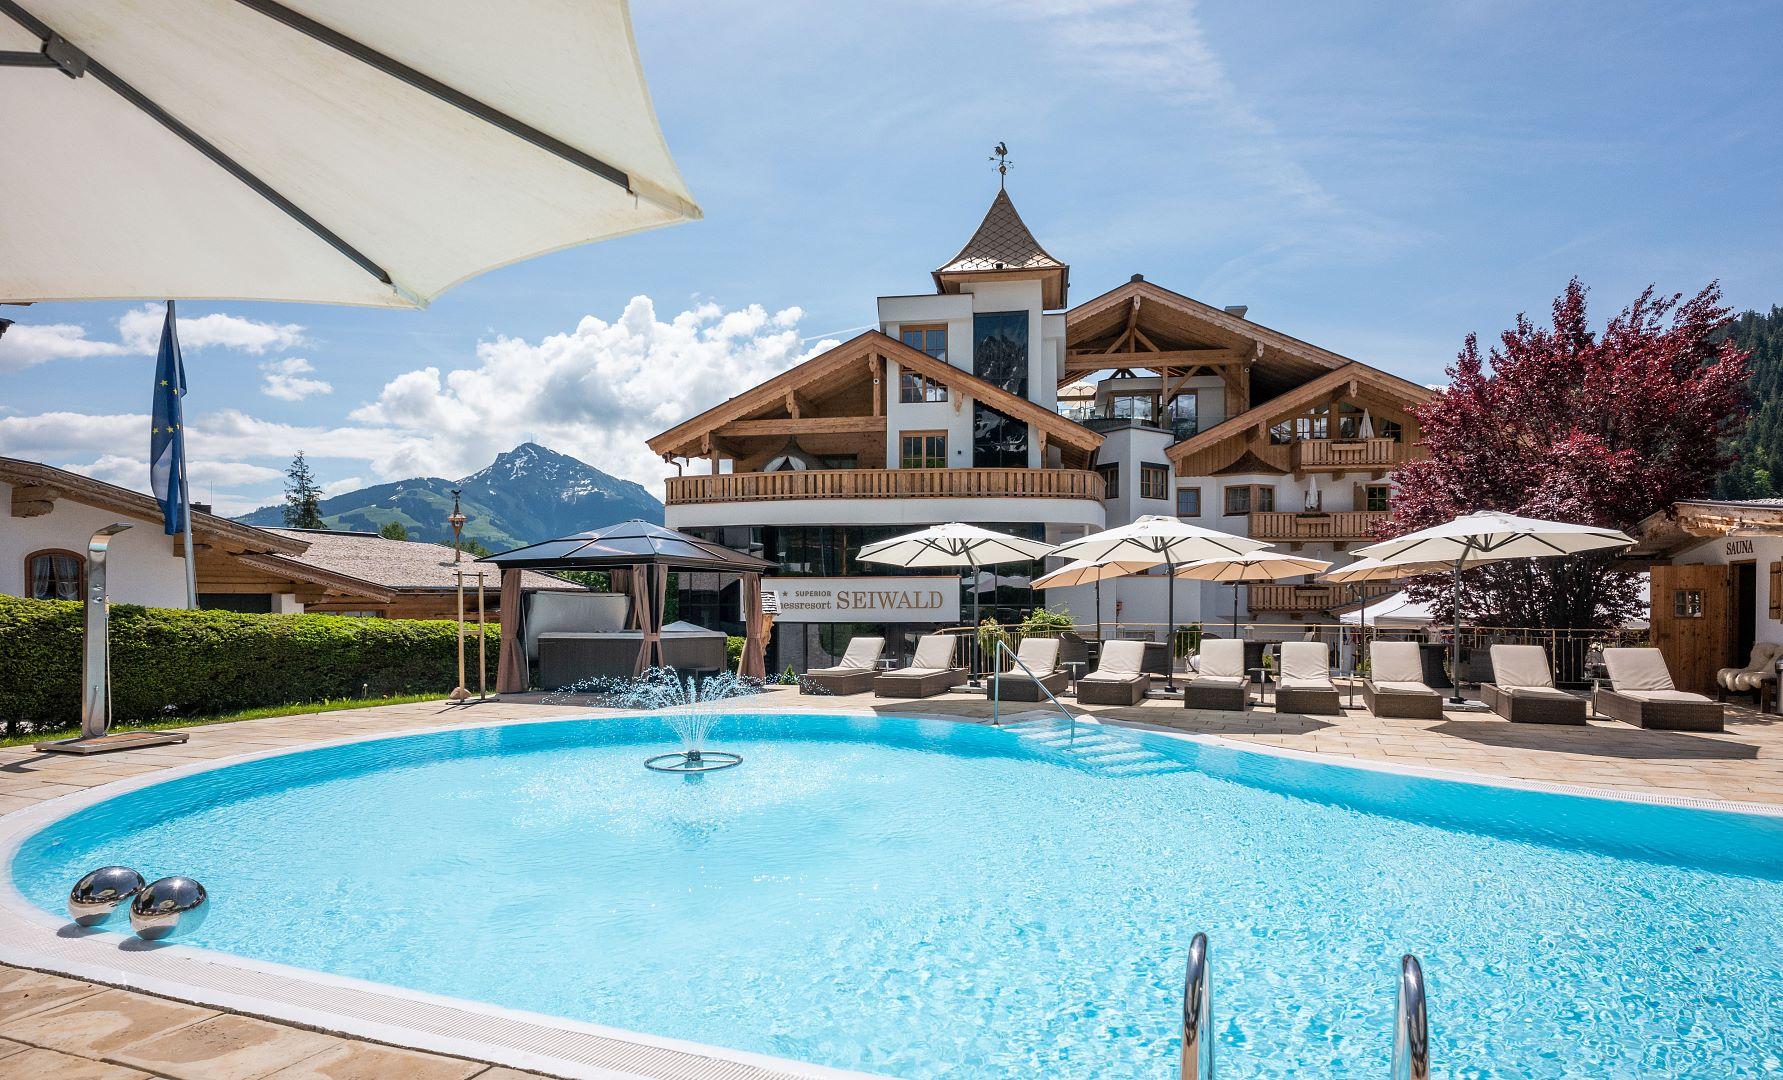 Hotel Seiwald Going am Wilden Kaiser